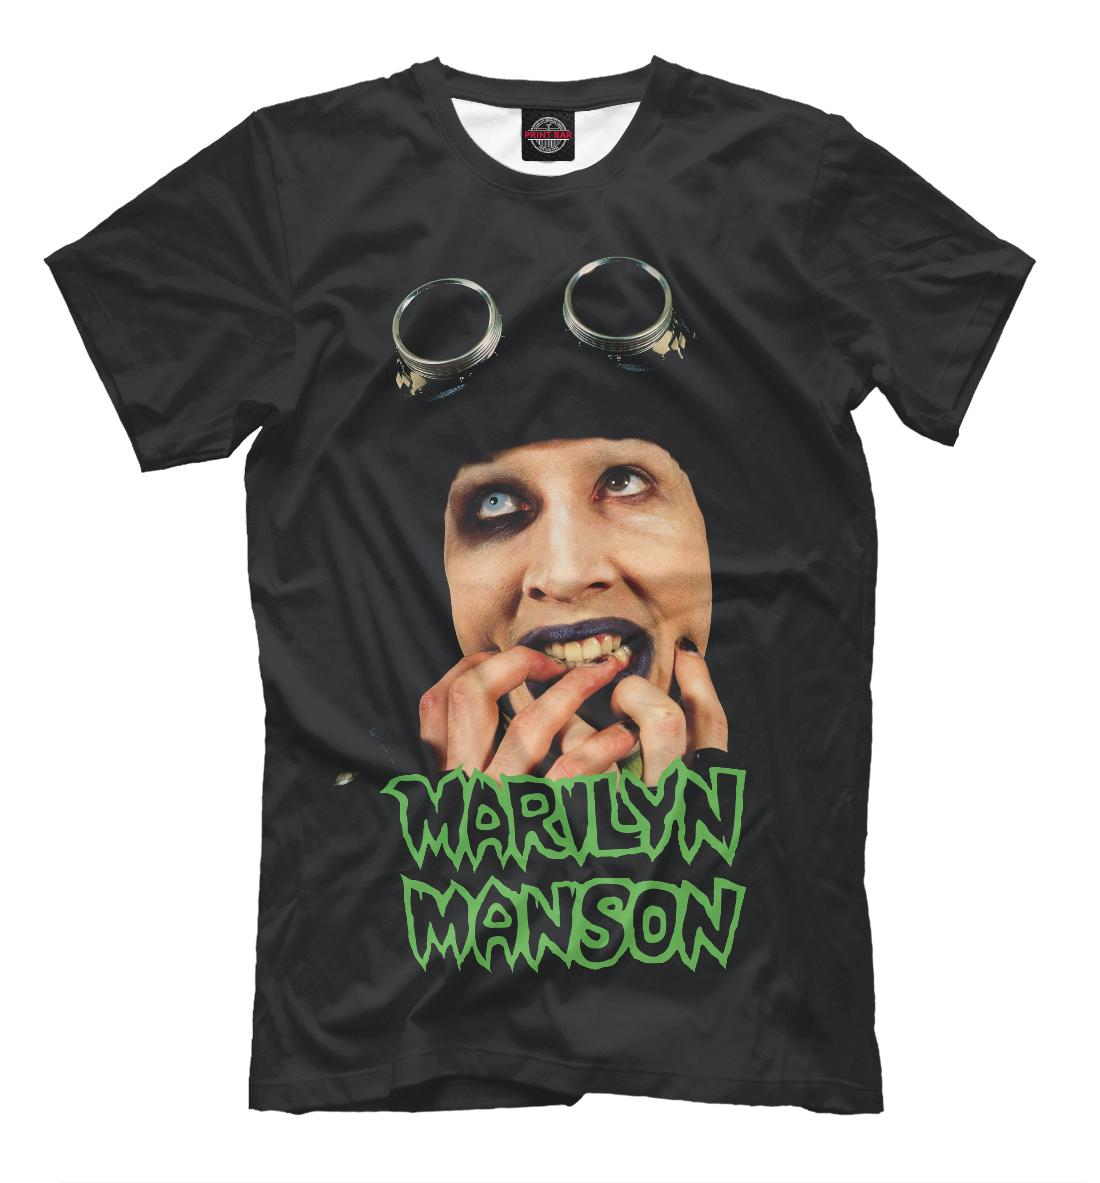 Купить Marilyn Manson, Printbar, Футболки, MRM-231556-fut-2